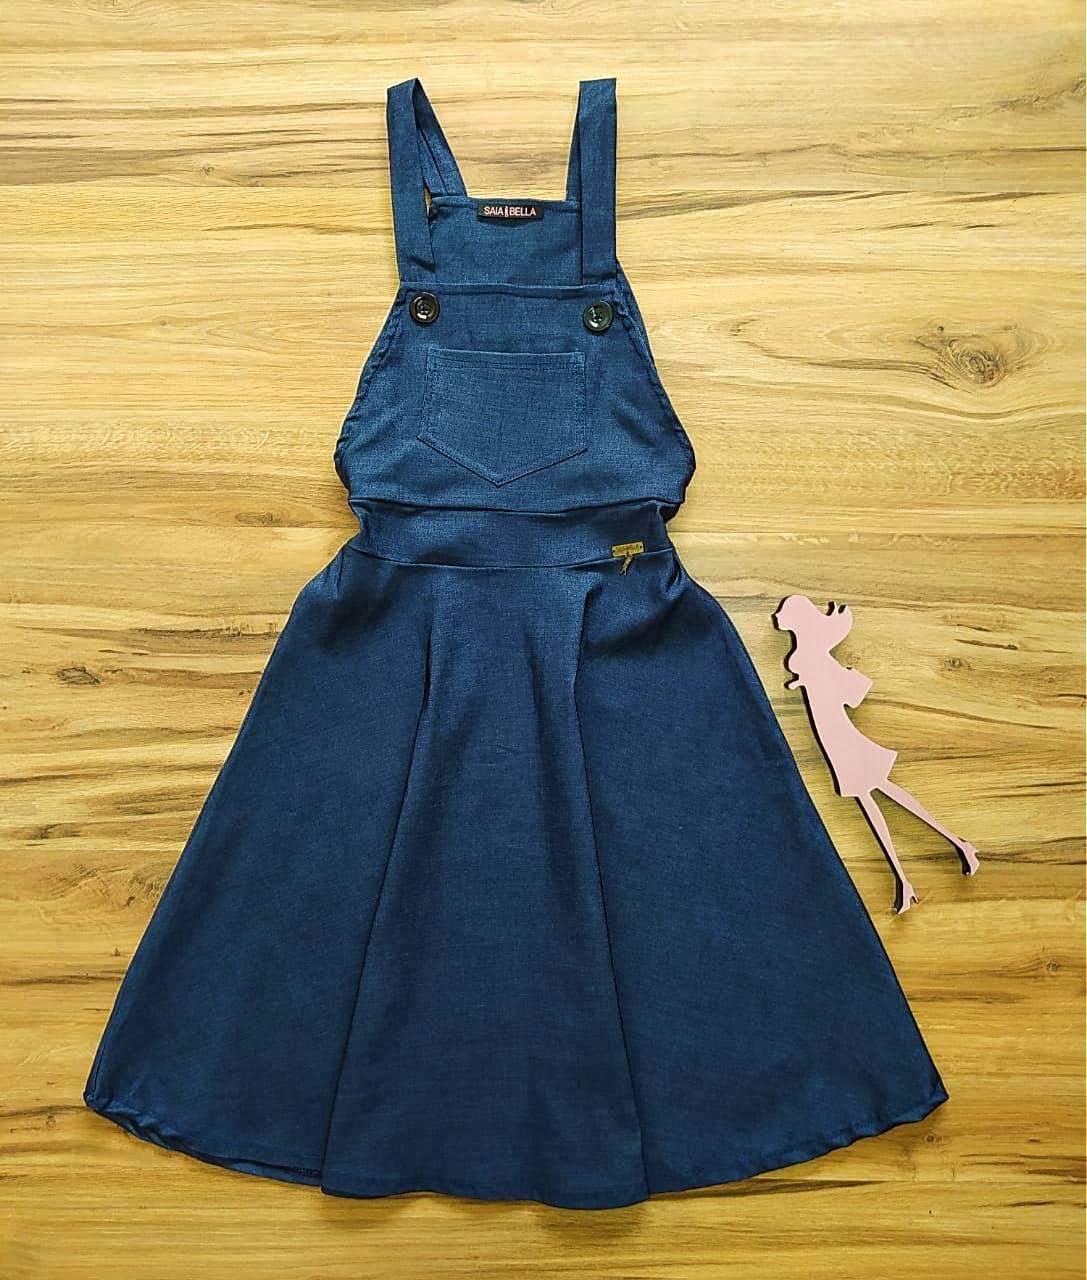 Salopete - Jardineira Mayara Saia Bella  SB51074142 Jeans Azul